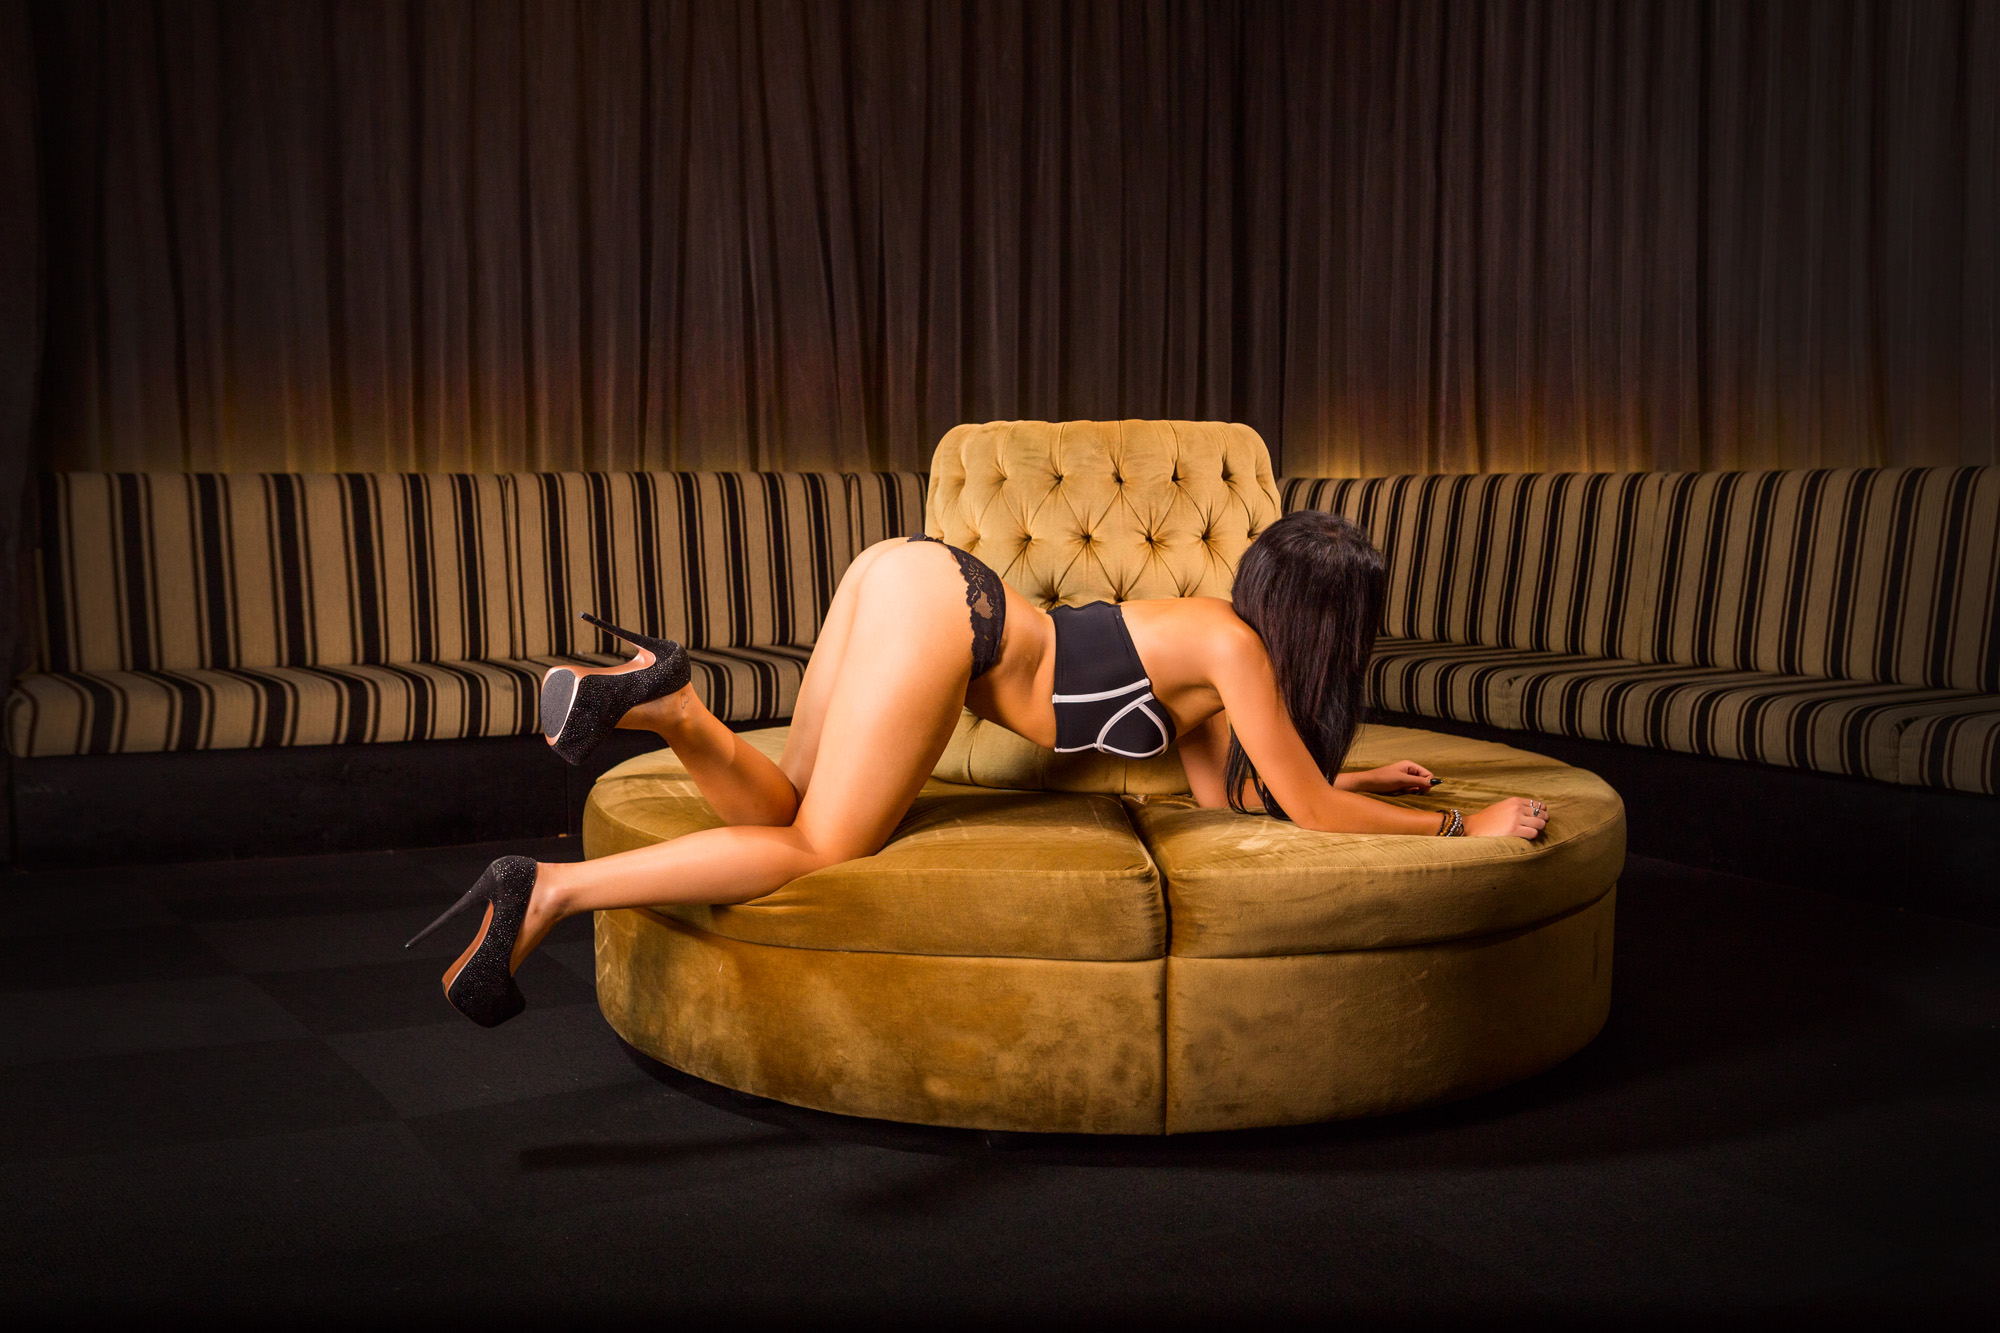 sex partner escort com